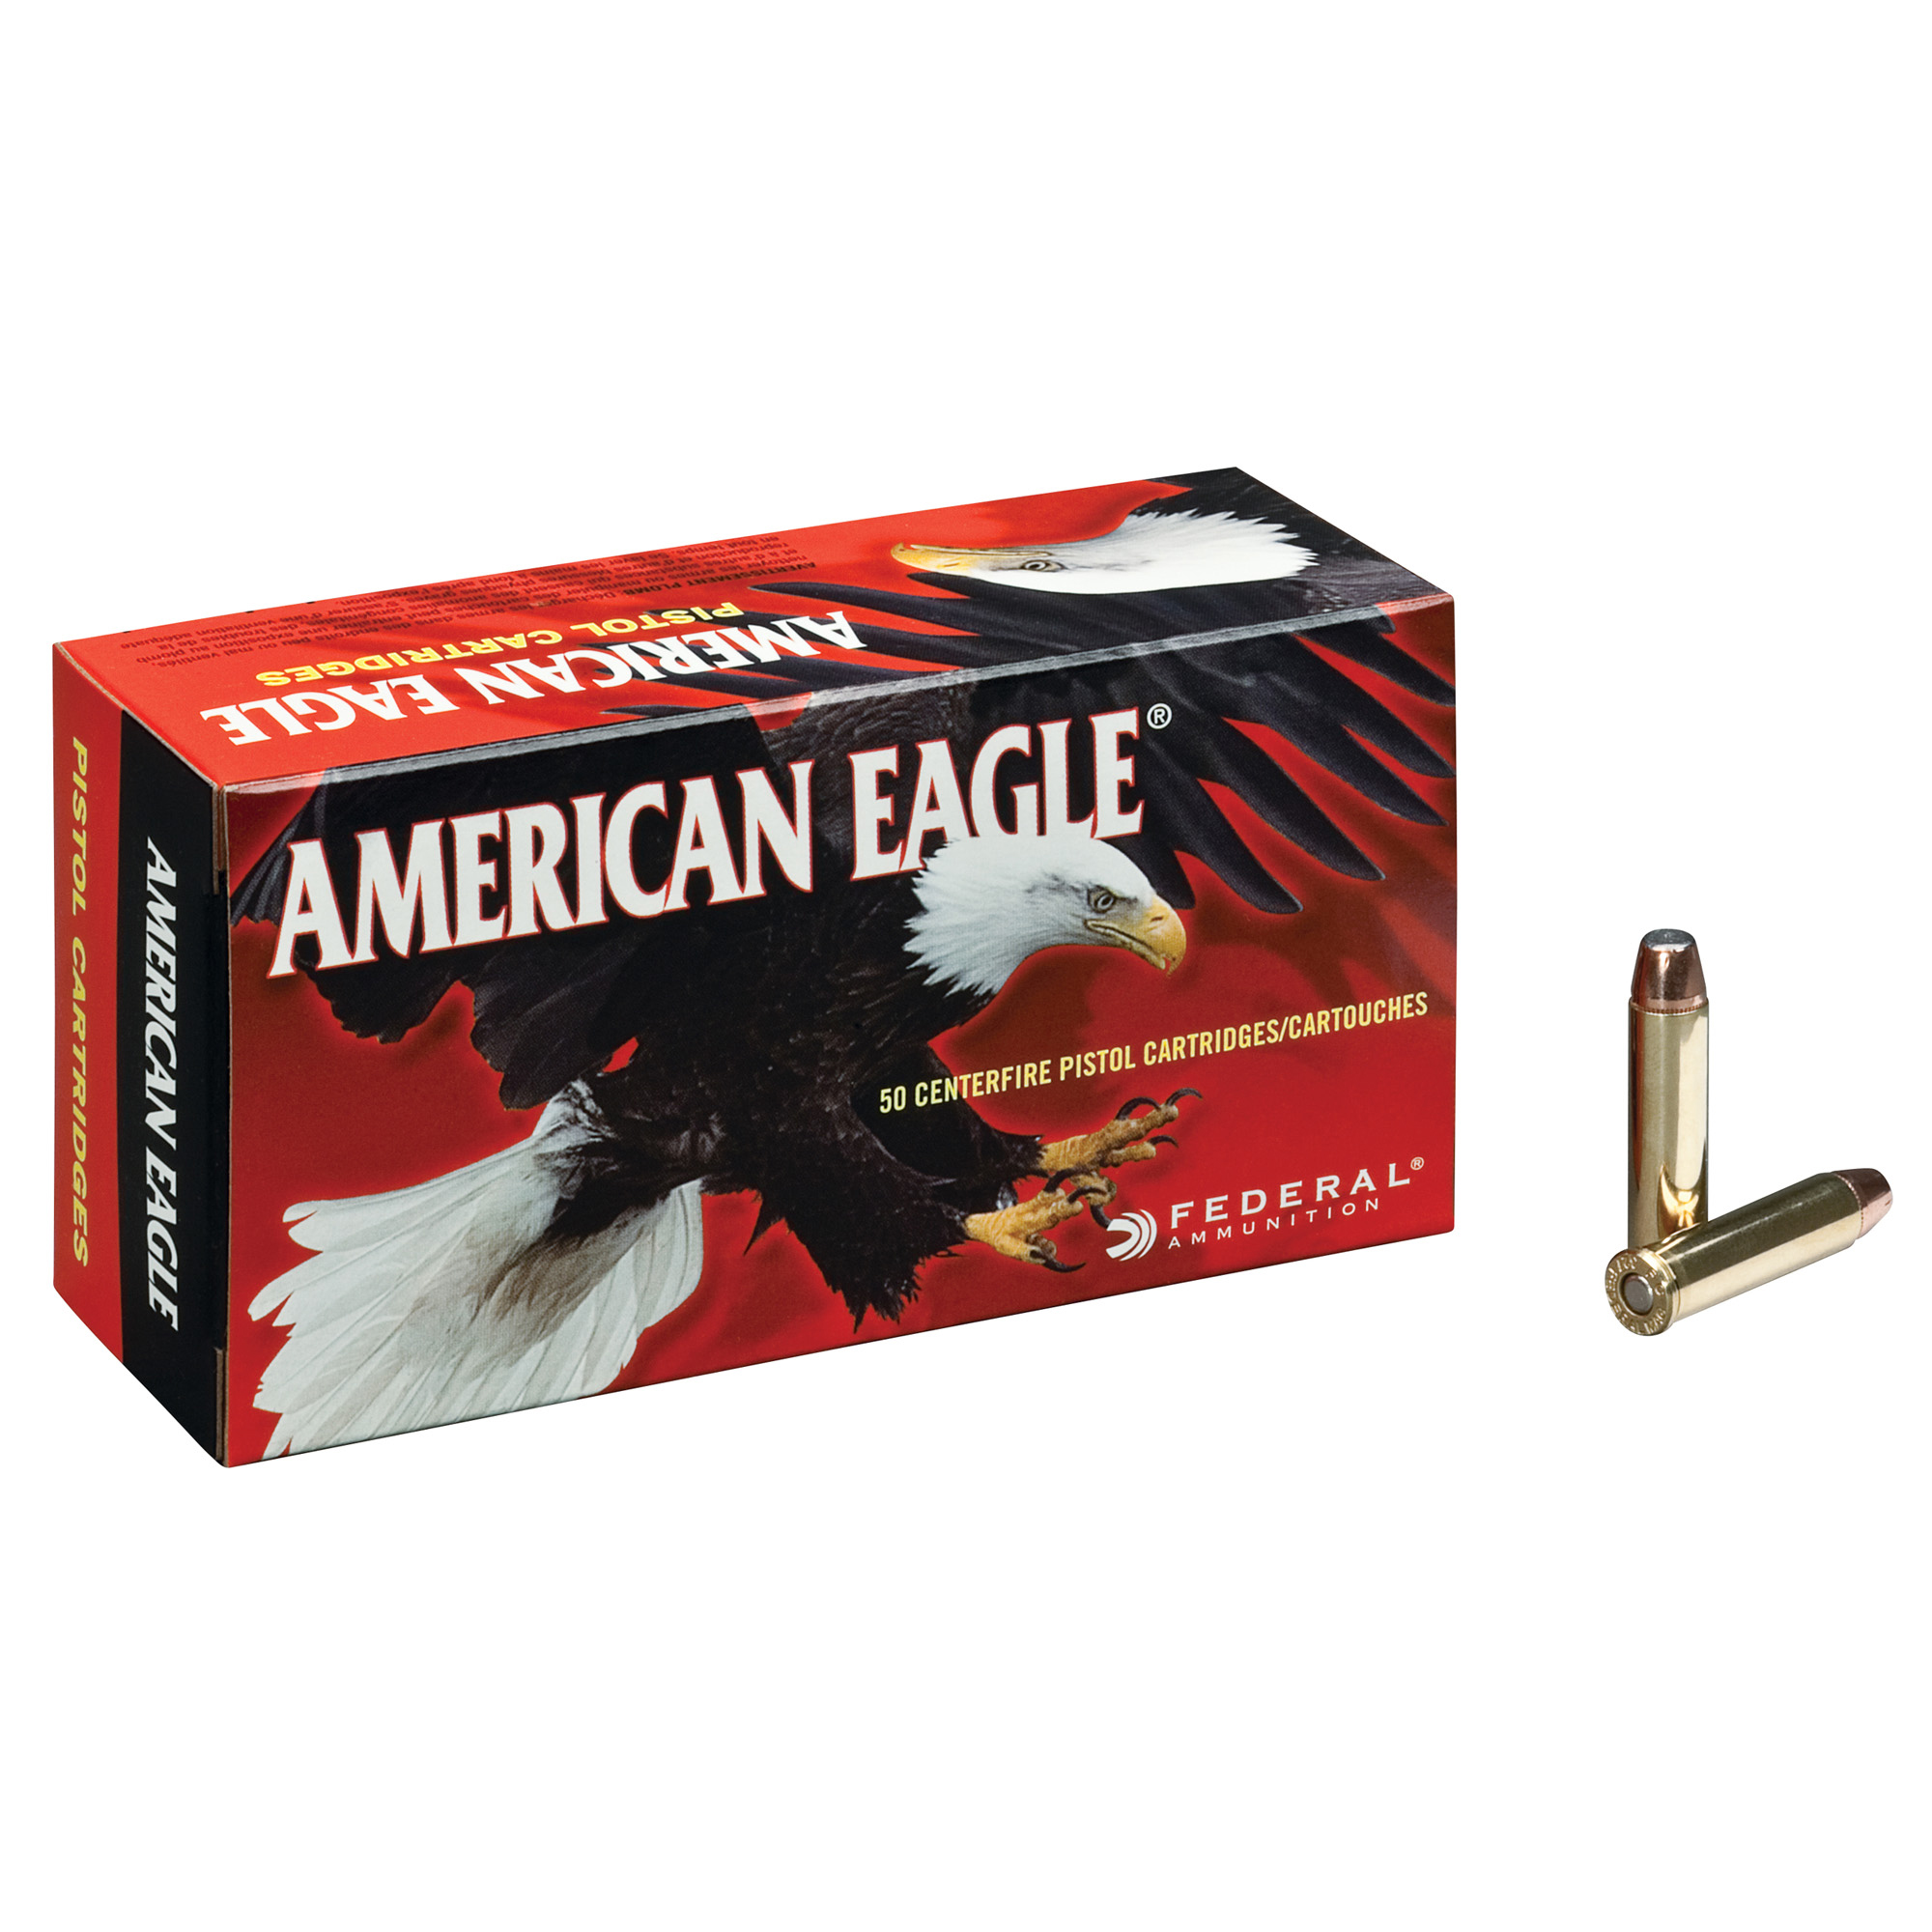 American Eagle Handgun Ammo, 9mm Luger, 115-gr, FMJ